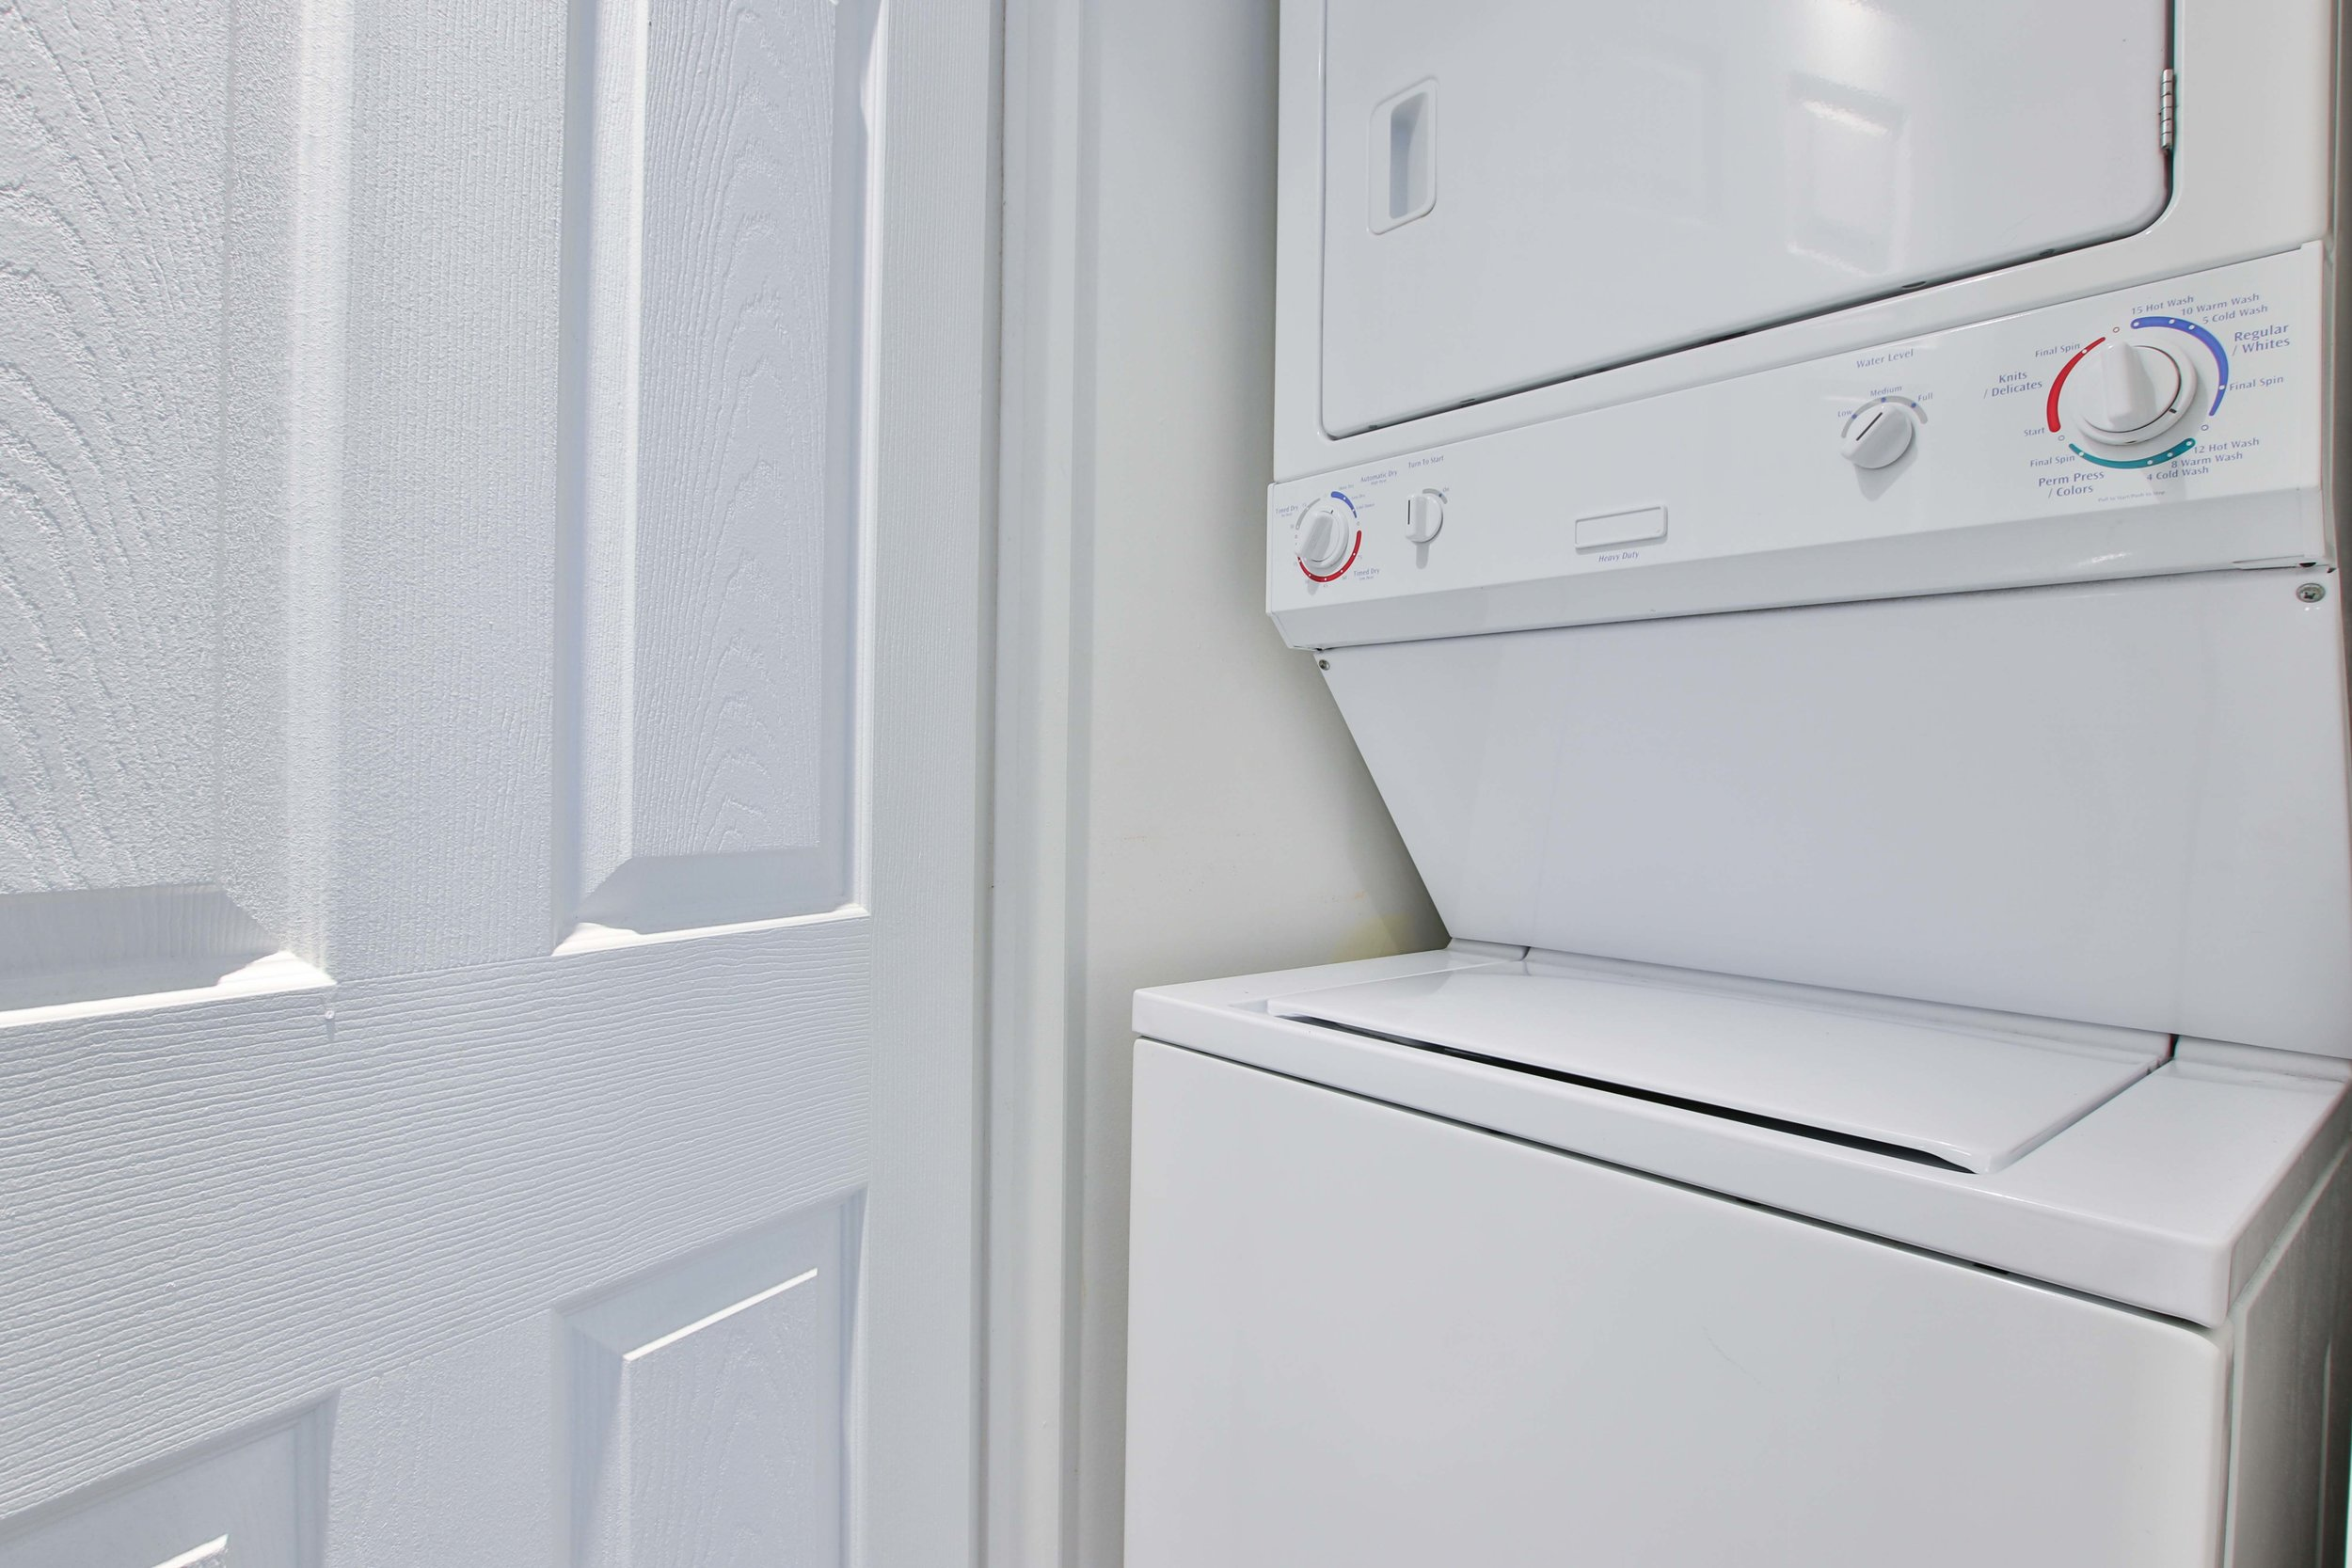 21_Laundry.jpg